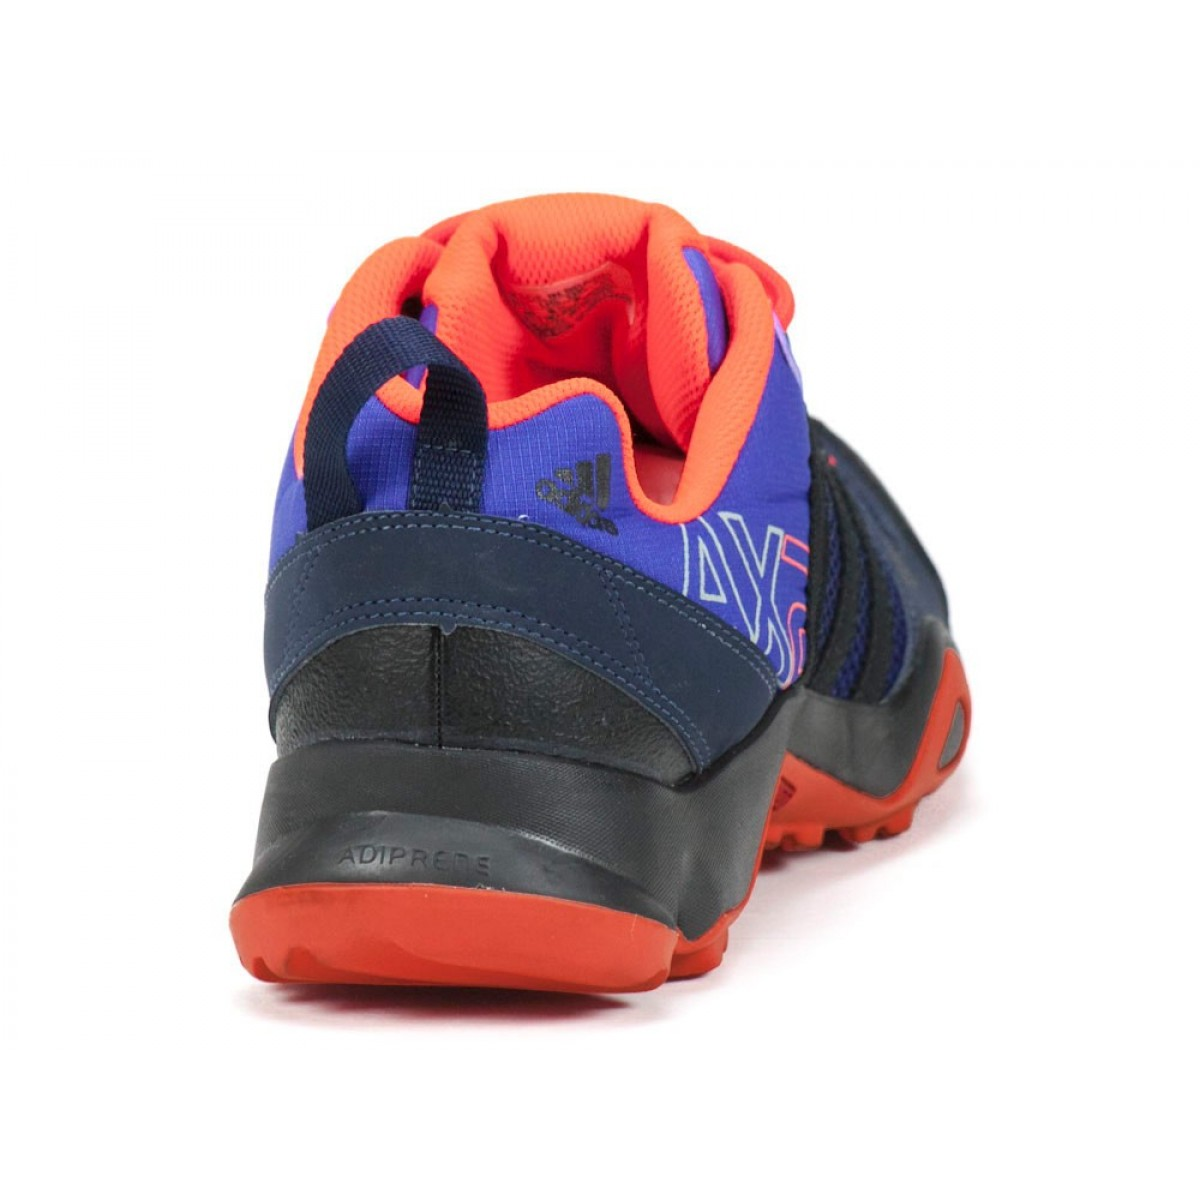 c3f8b3c545 Tênis Masculino Adidas AX2 - Compre Agora